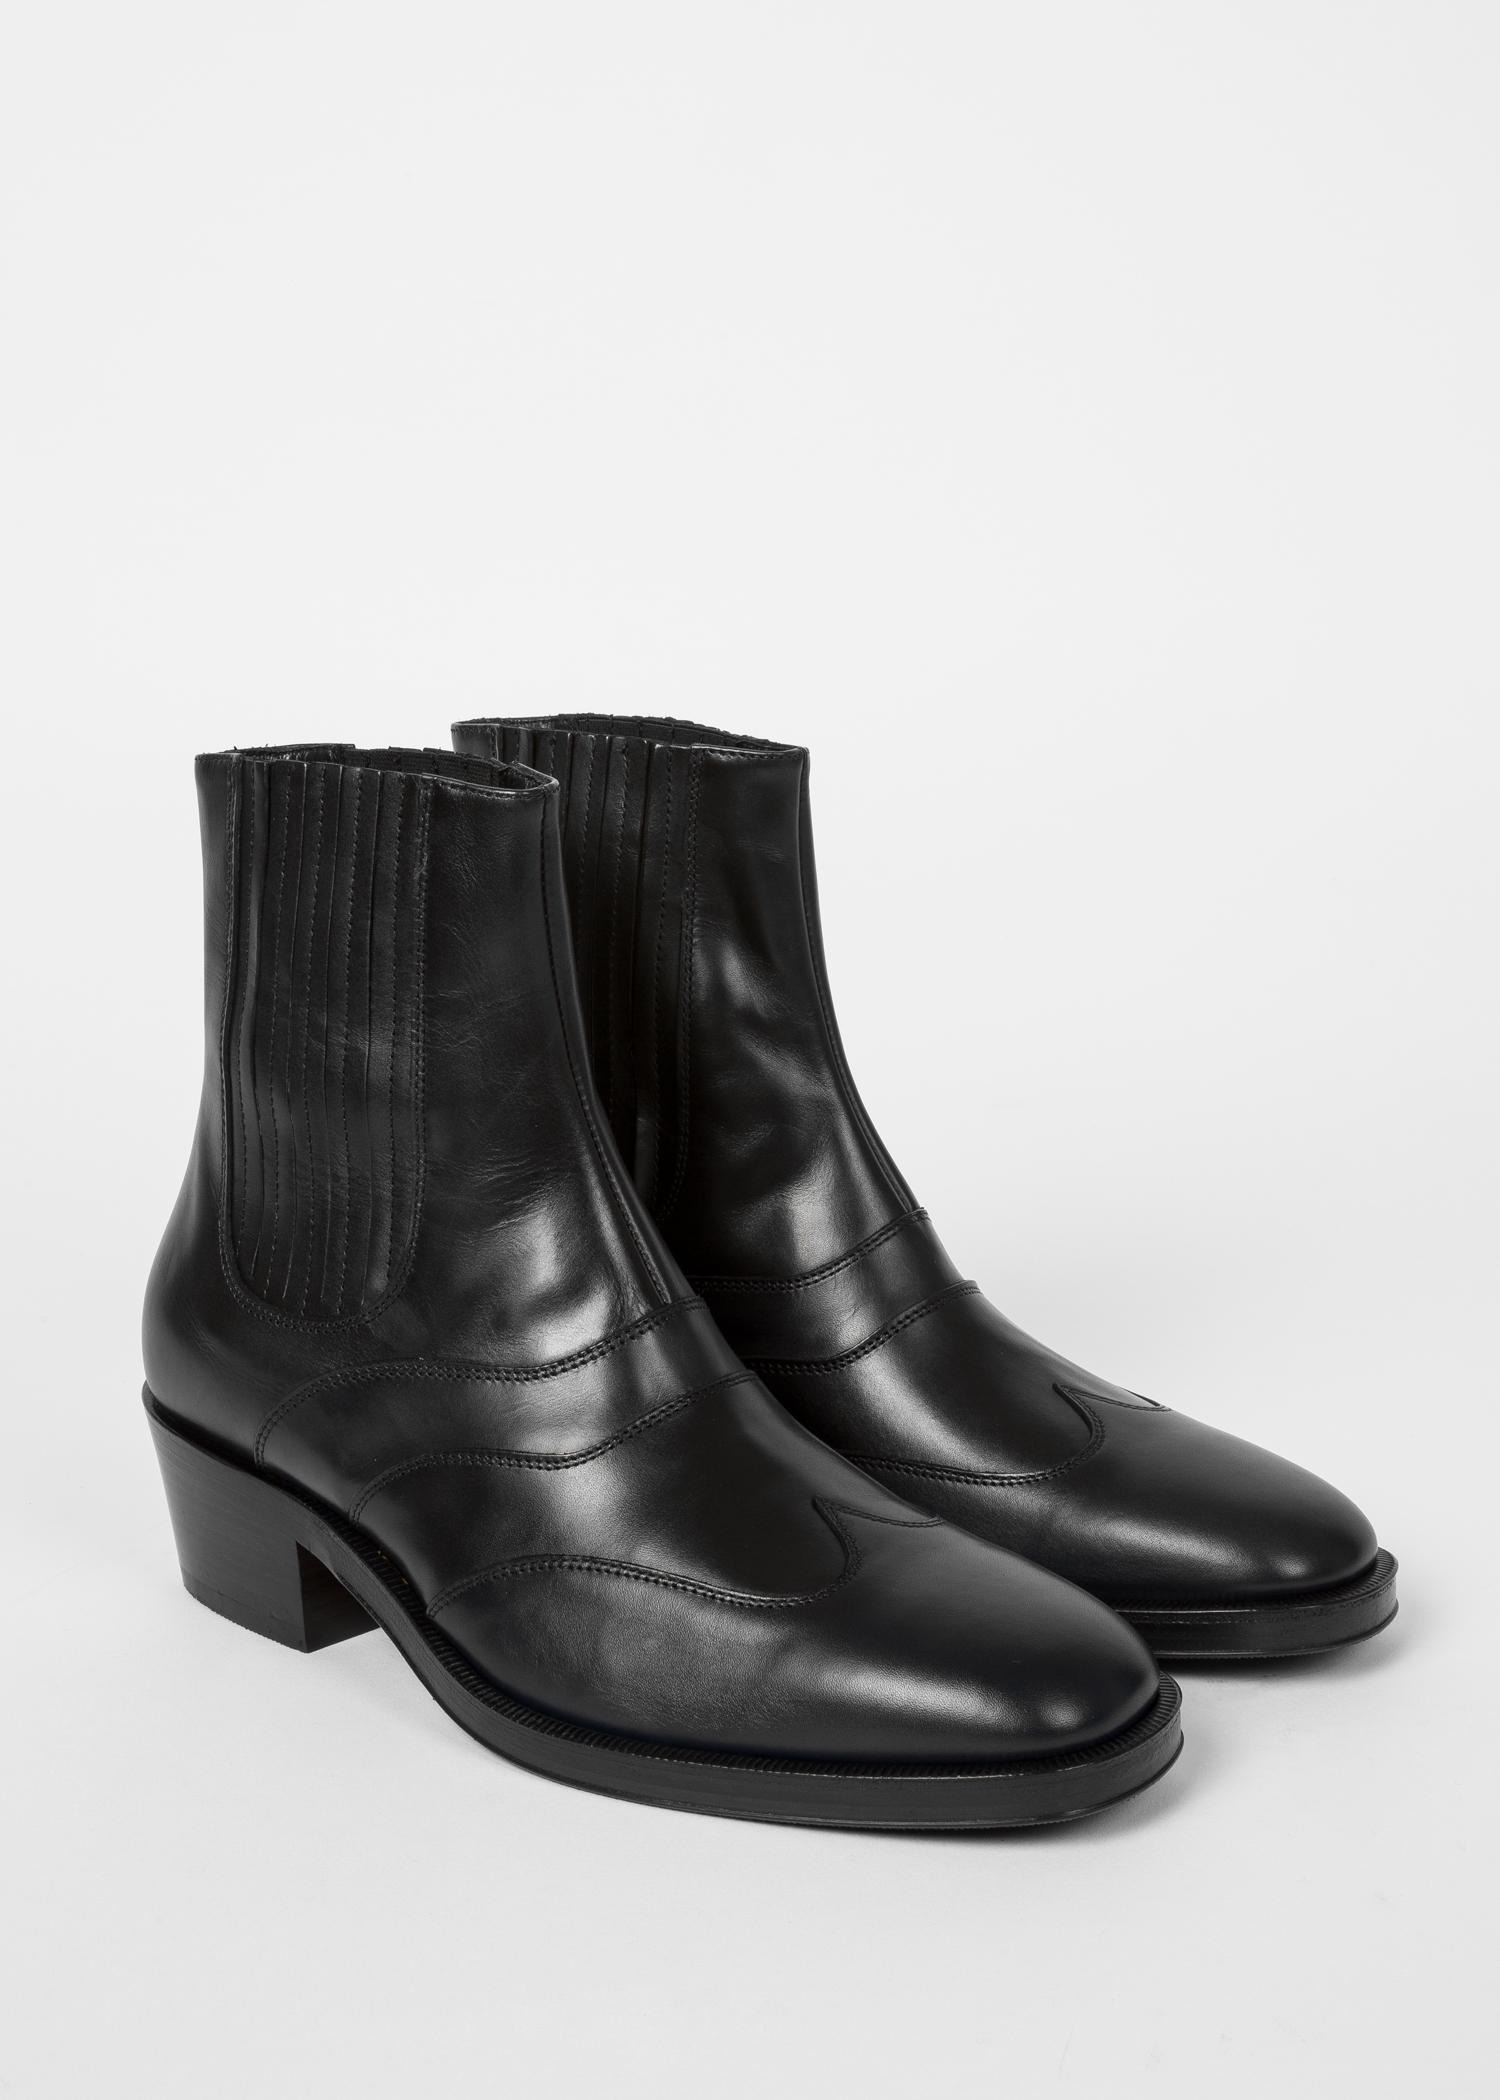 b748c959d1613 Diagonal view men dark navy and black leather anvil chelsea boots jpg  1500x2100 Dark navy boots